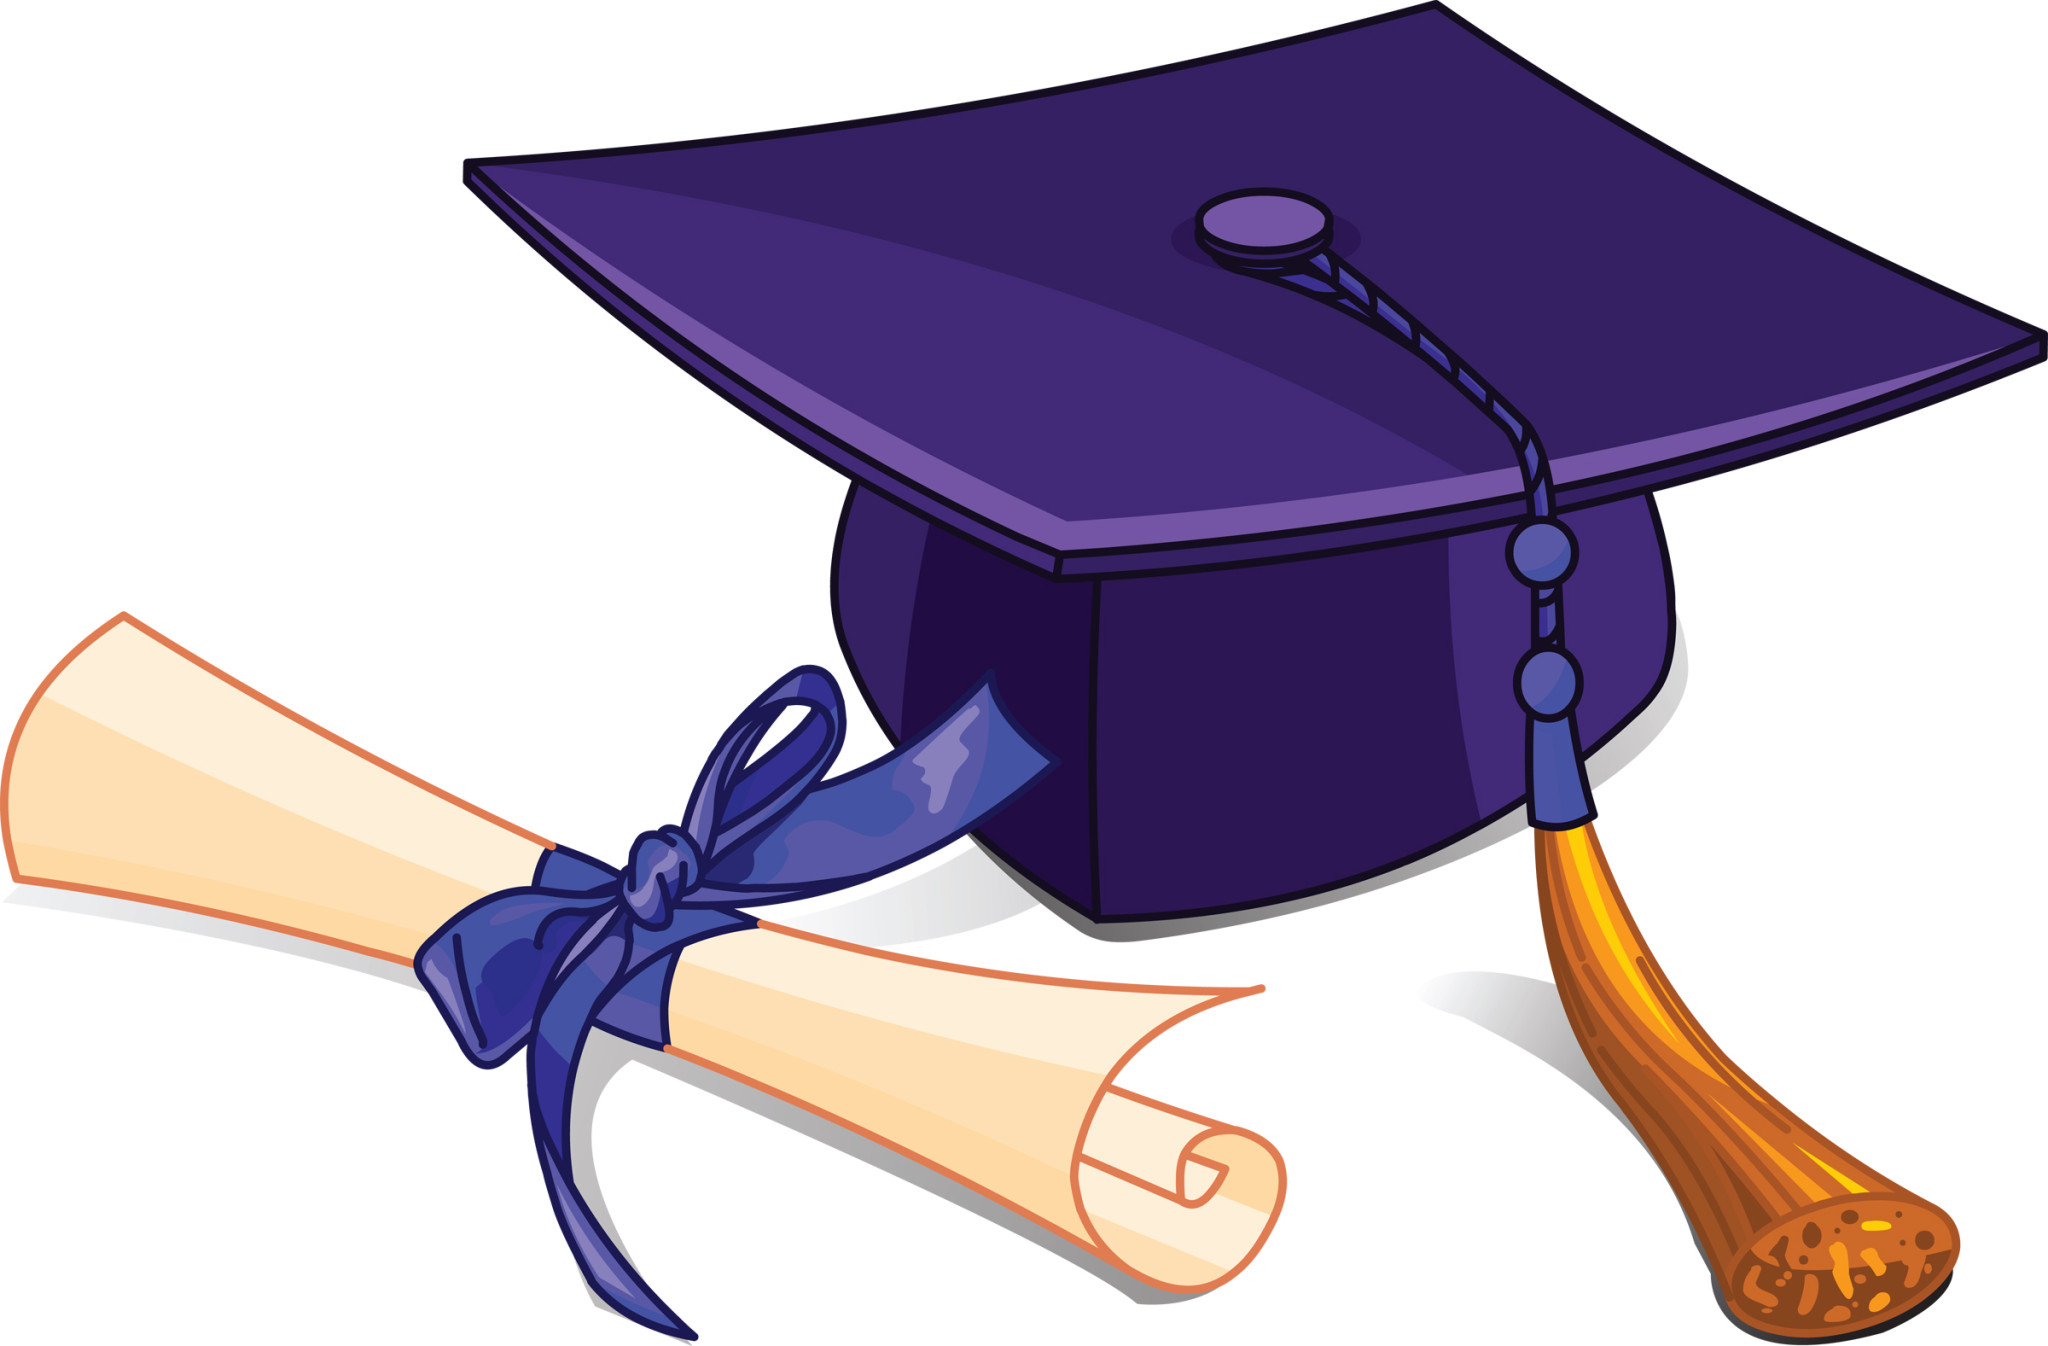 th grade class. 2016 clipart graduation hat